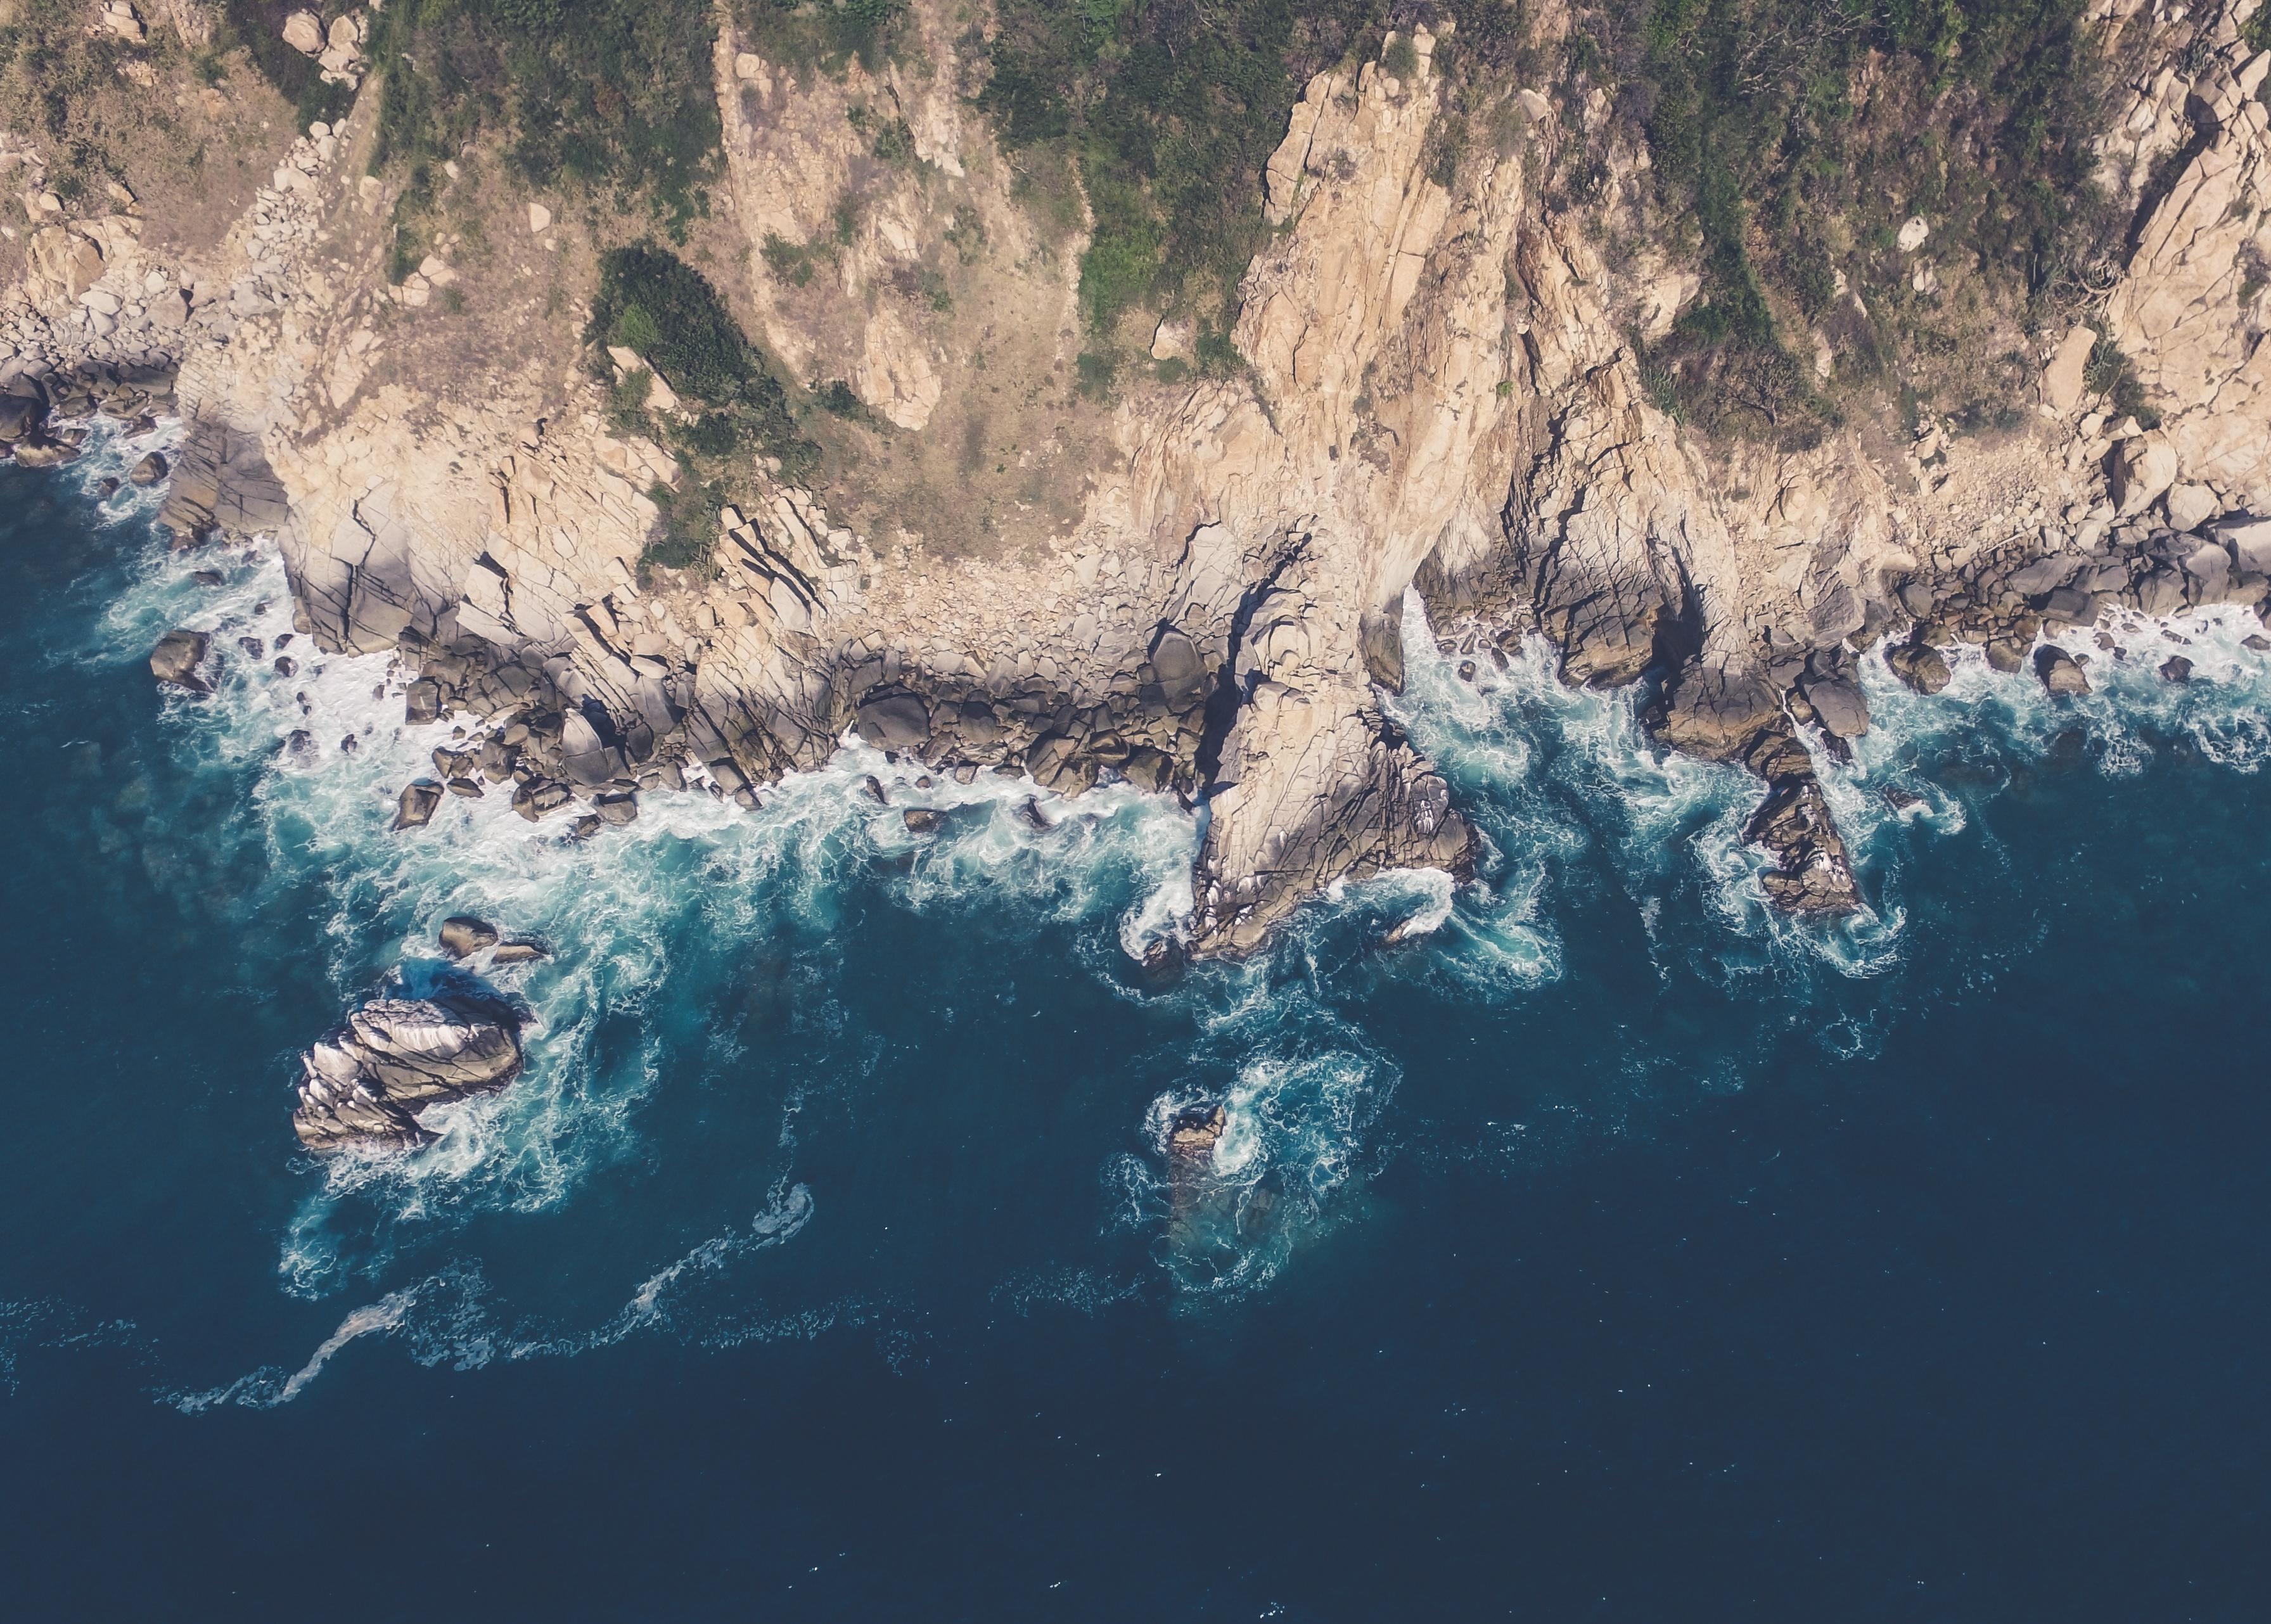 Coast of Acapulco Mexico, coast, cliff, rocks, beach, shore, sea, ocean, waves, water, blue